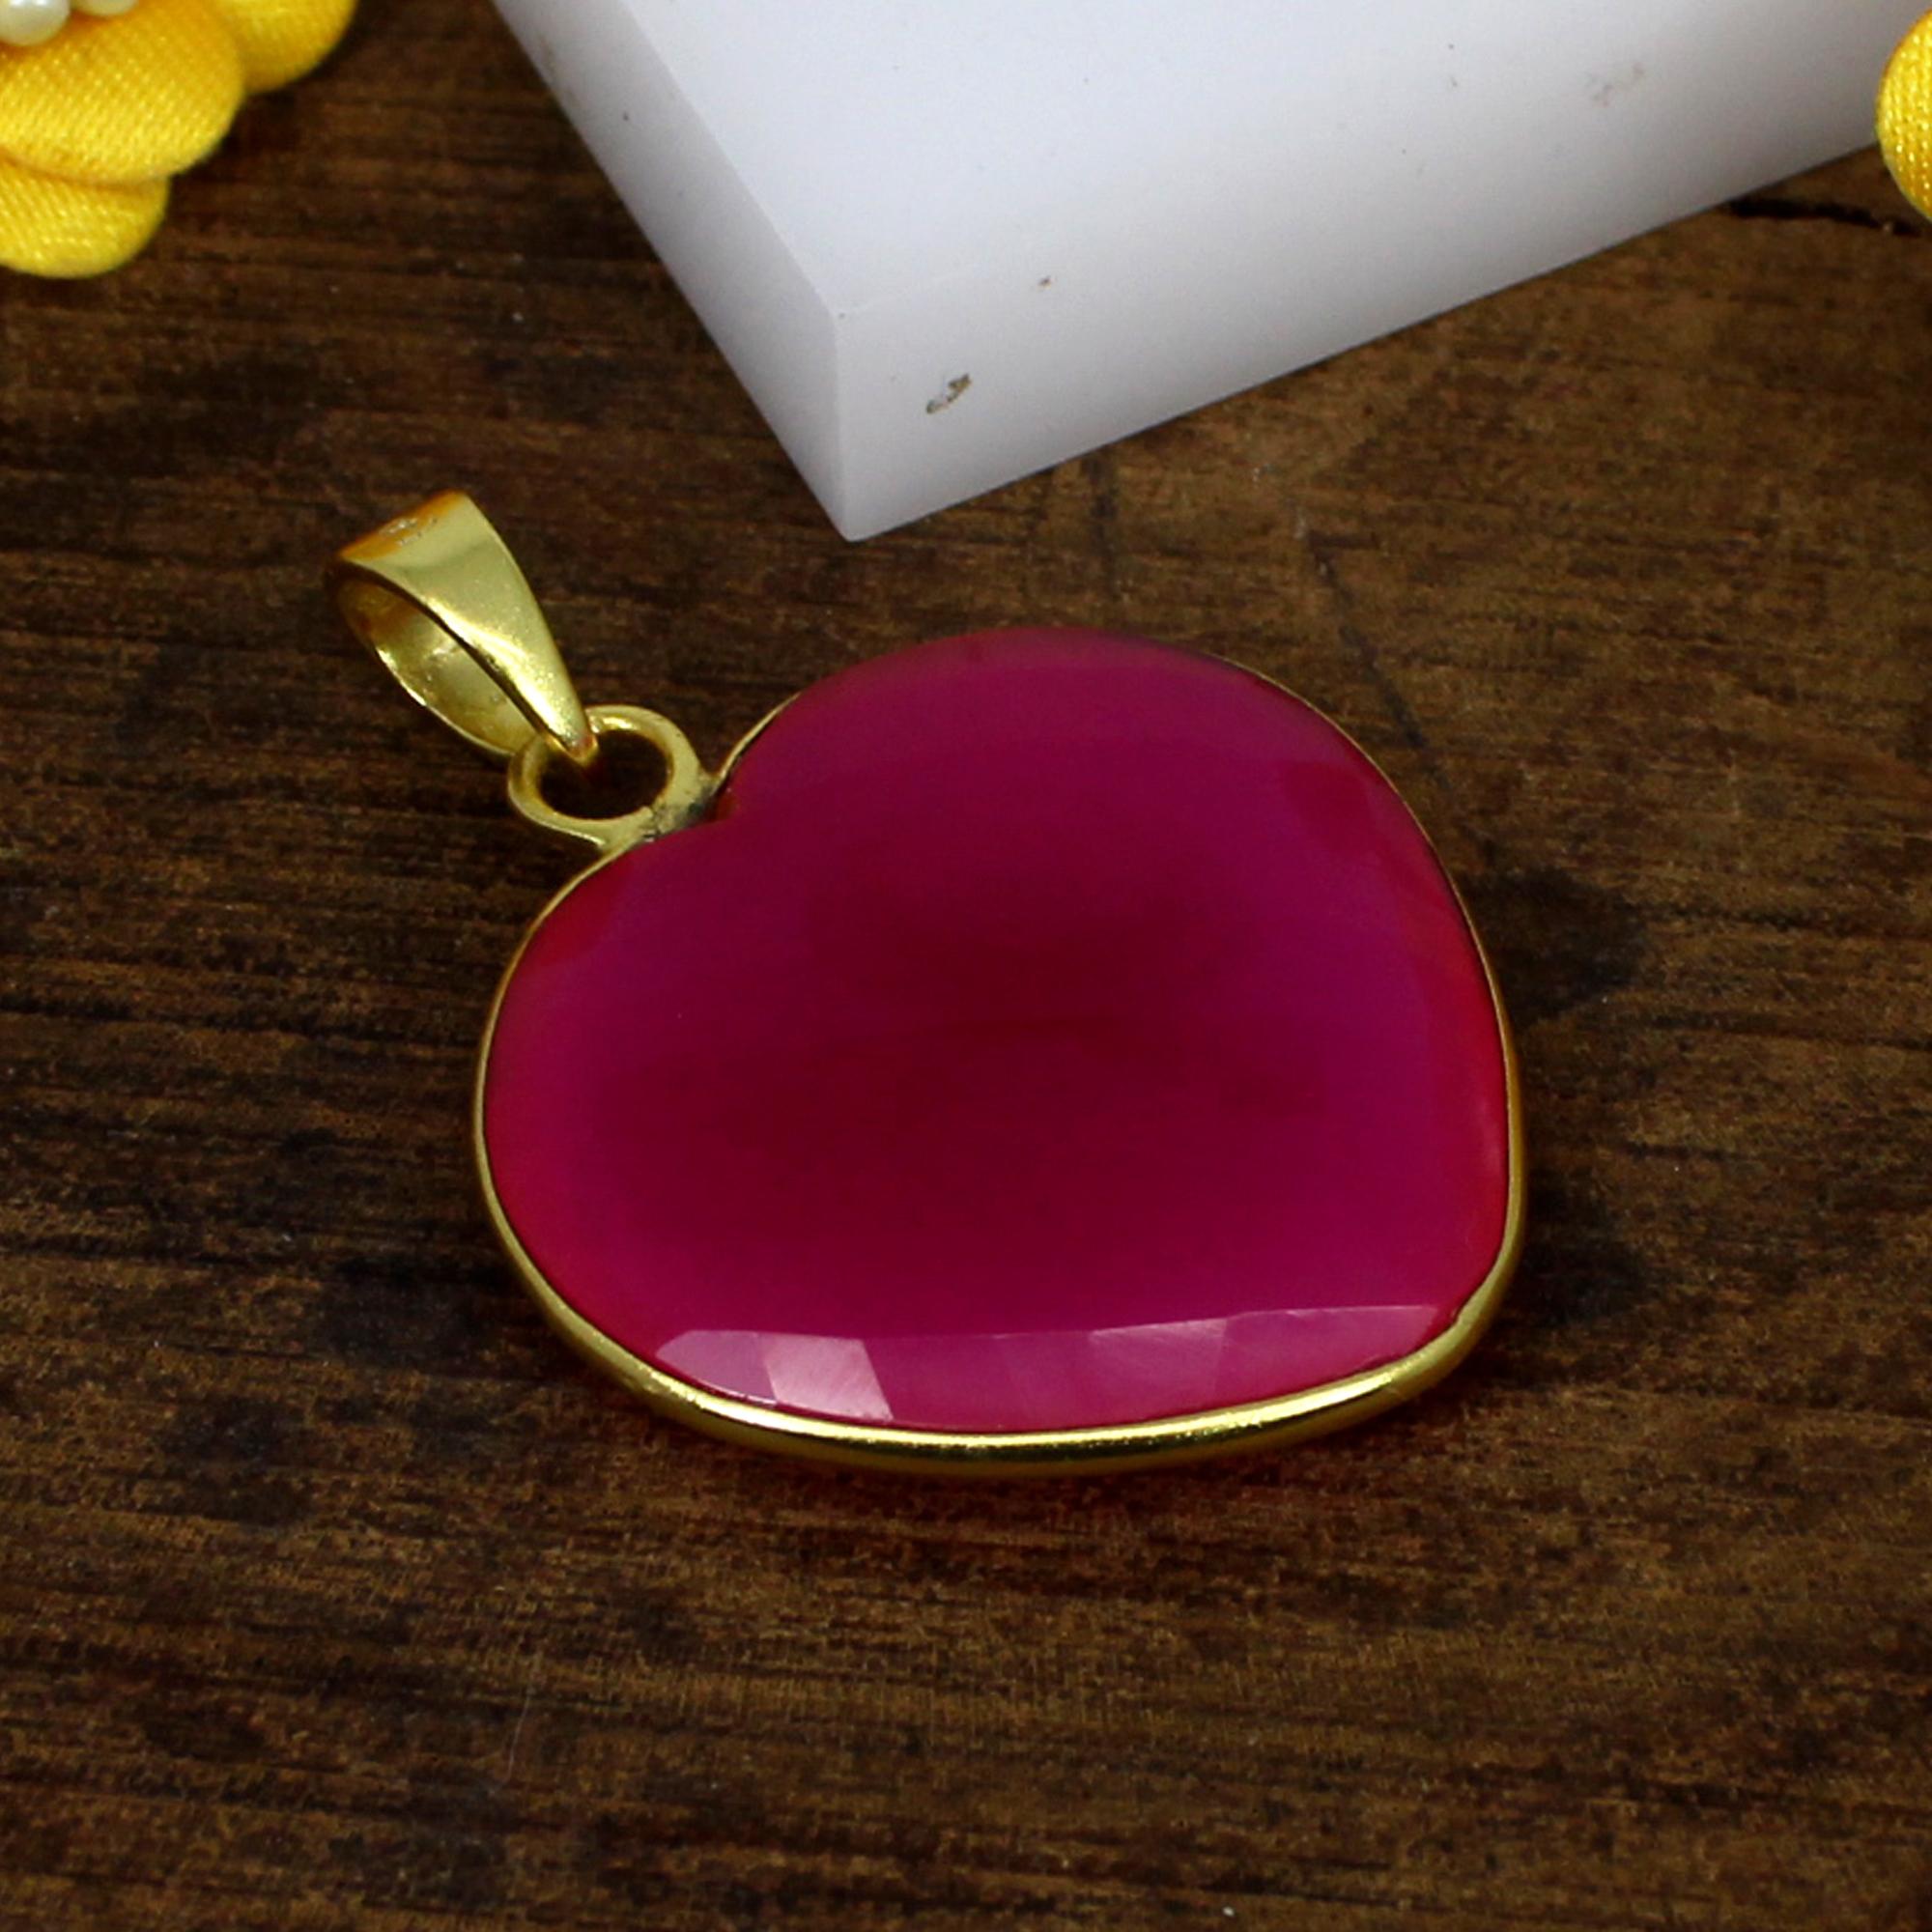 Exclusive Women Jewelry Fuchsia Chalcedony Gemstone Pendant Brass Gold Plated Pendant Romantic Heart Designer Pendant